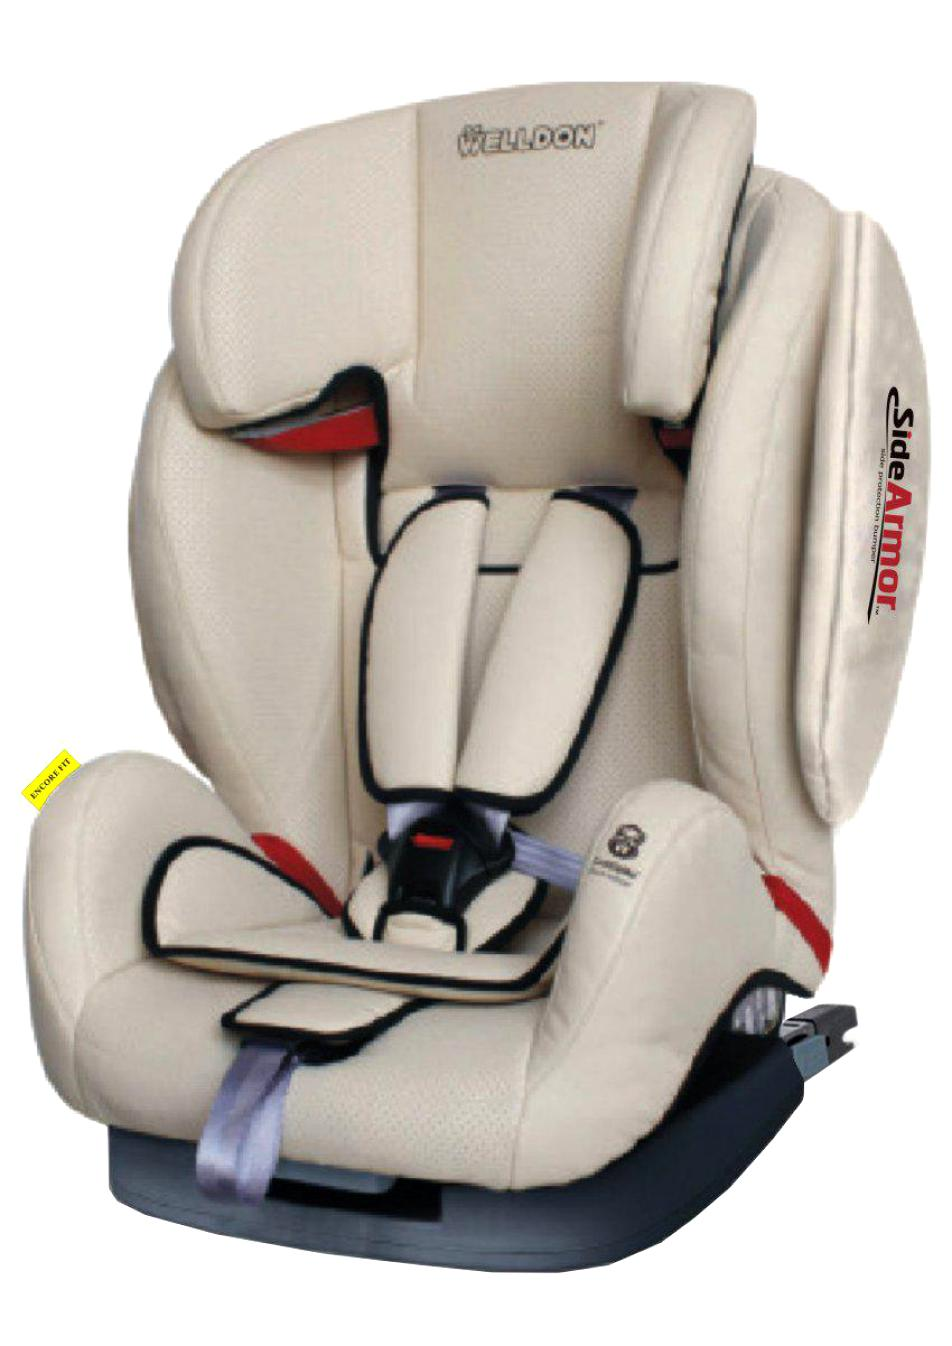 Автокресло welldon: варианты royal baby dual fit 2, encore и magic nacre на 9-25 кг, sidearmor cuddleme iso fix от 0 лет, отзывы